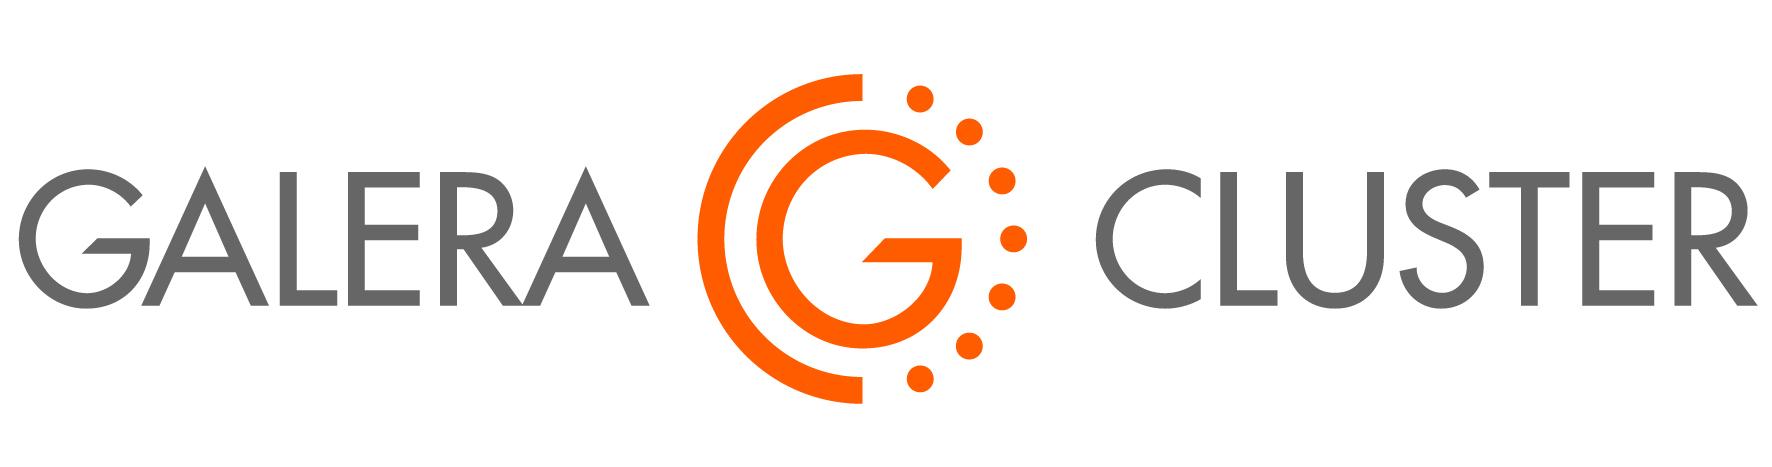 galera_cluster_logo